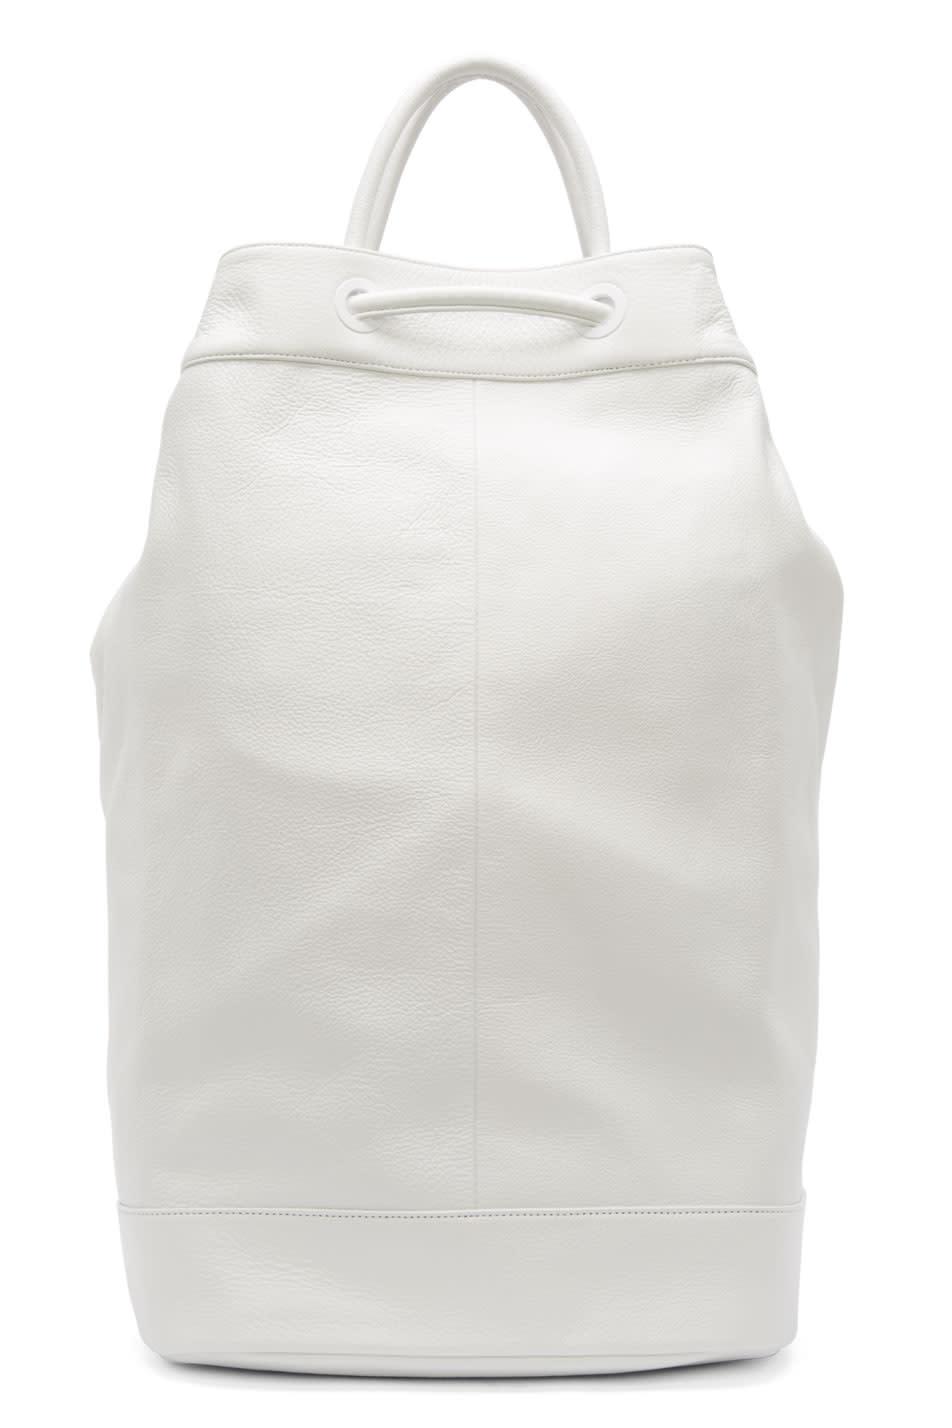 Juun.j White Leather Drawstring Backpack